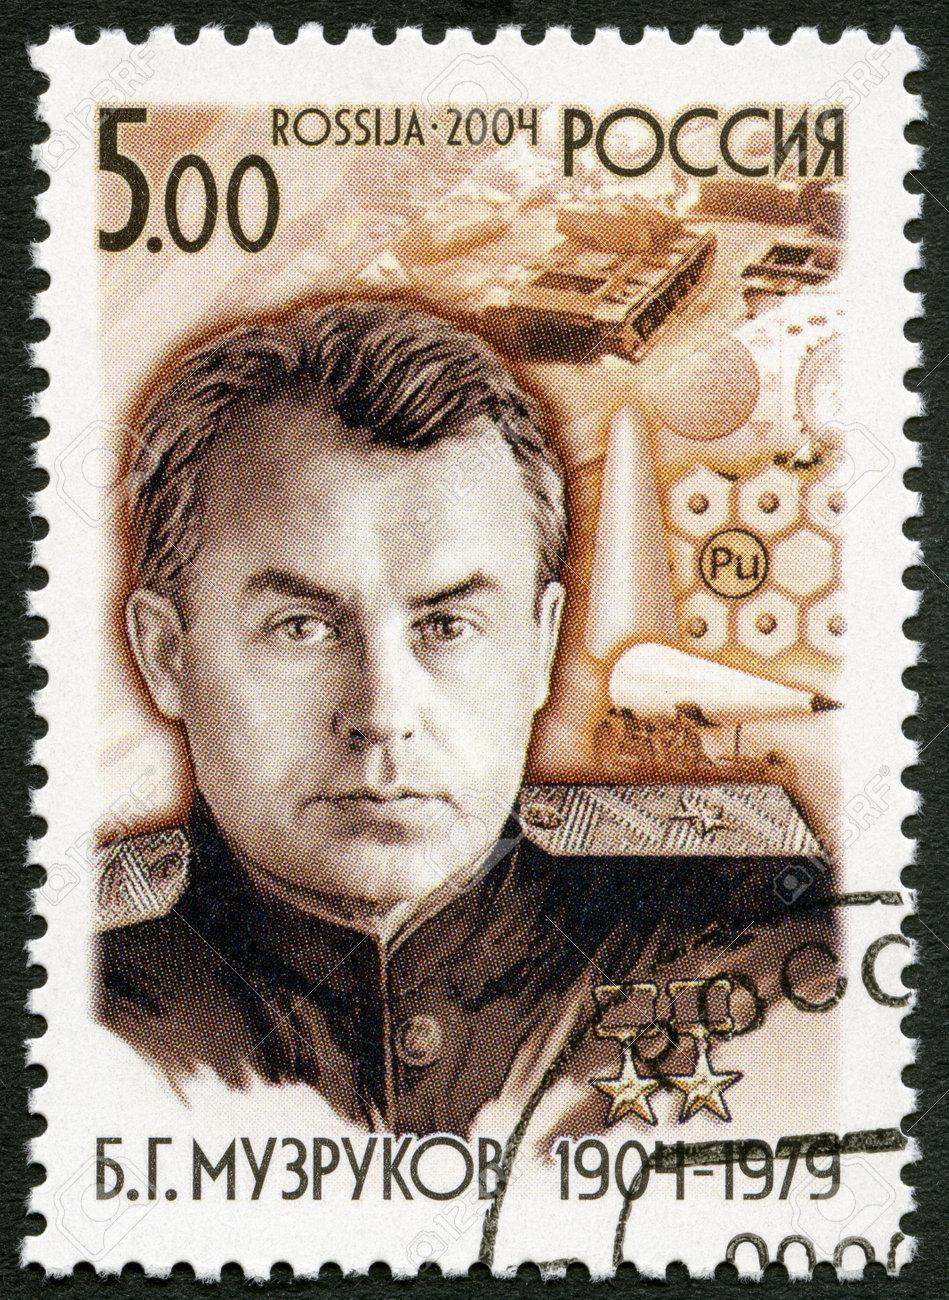 RUSSIA - CIRCA 2004: A stamp printed in Russia dedicated the birth centenary of B.G. Muzrukov, organizer of defense industry, circa 2004 Stock Photo - 21274664